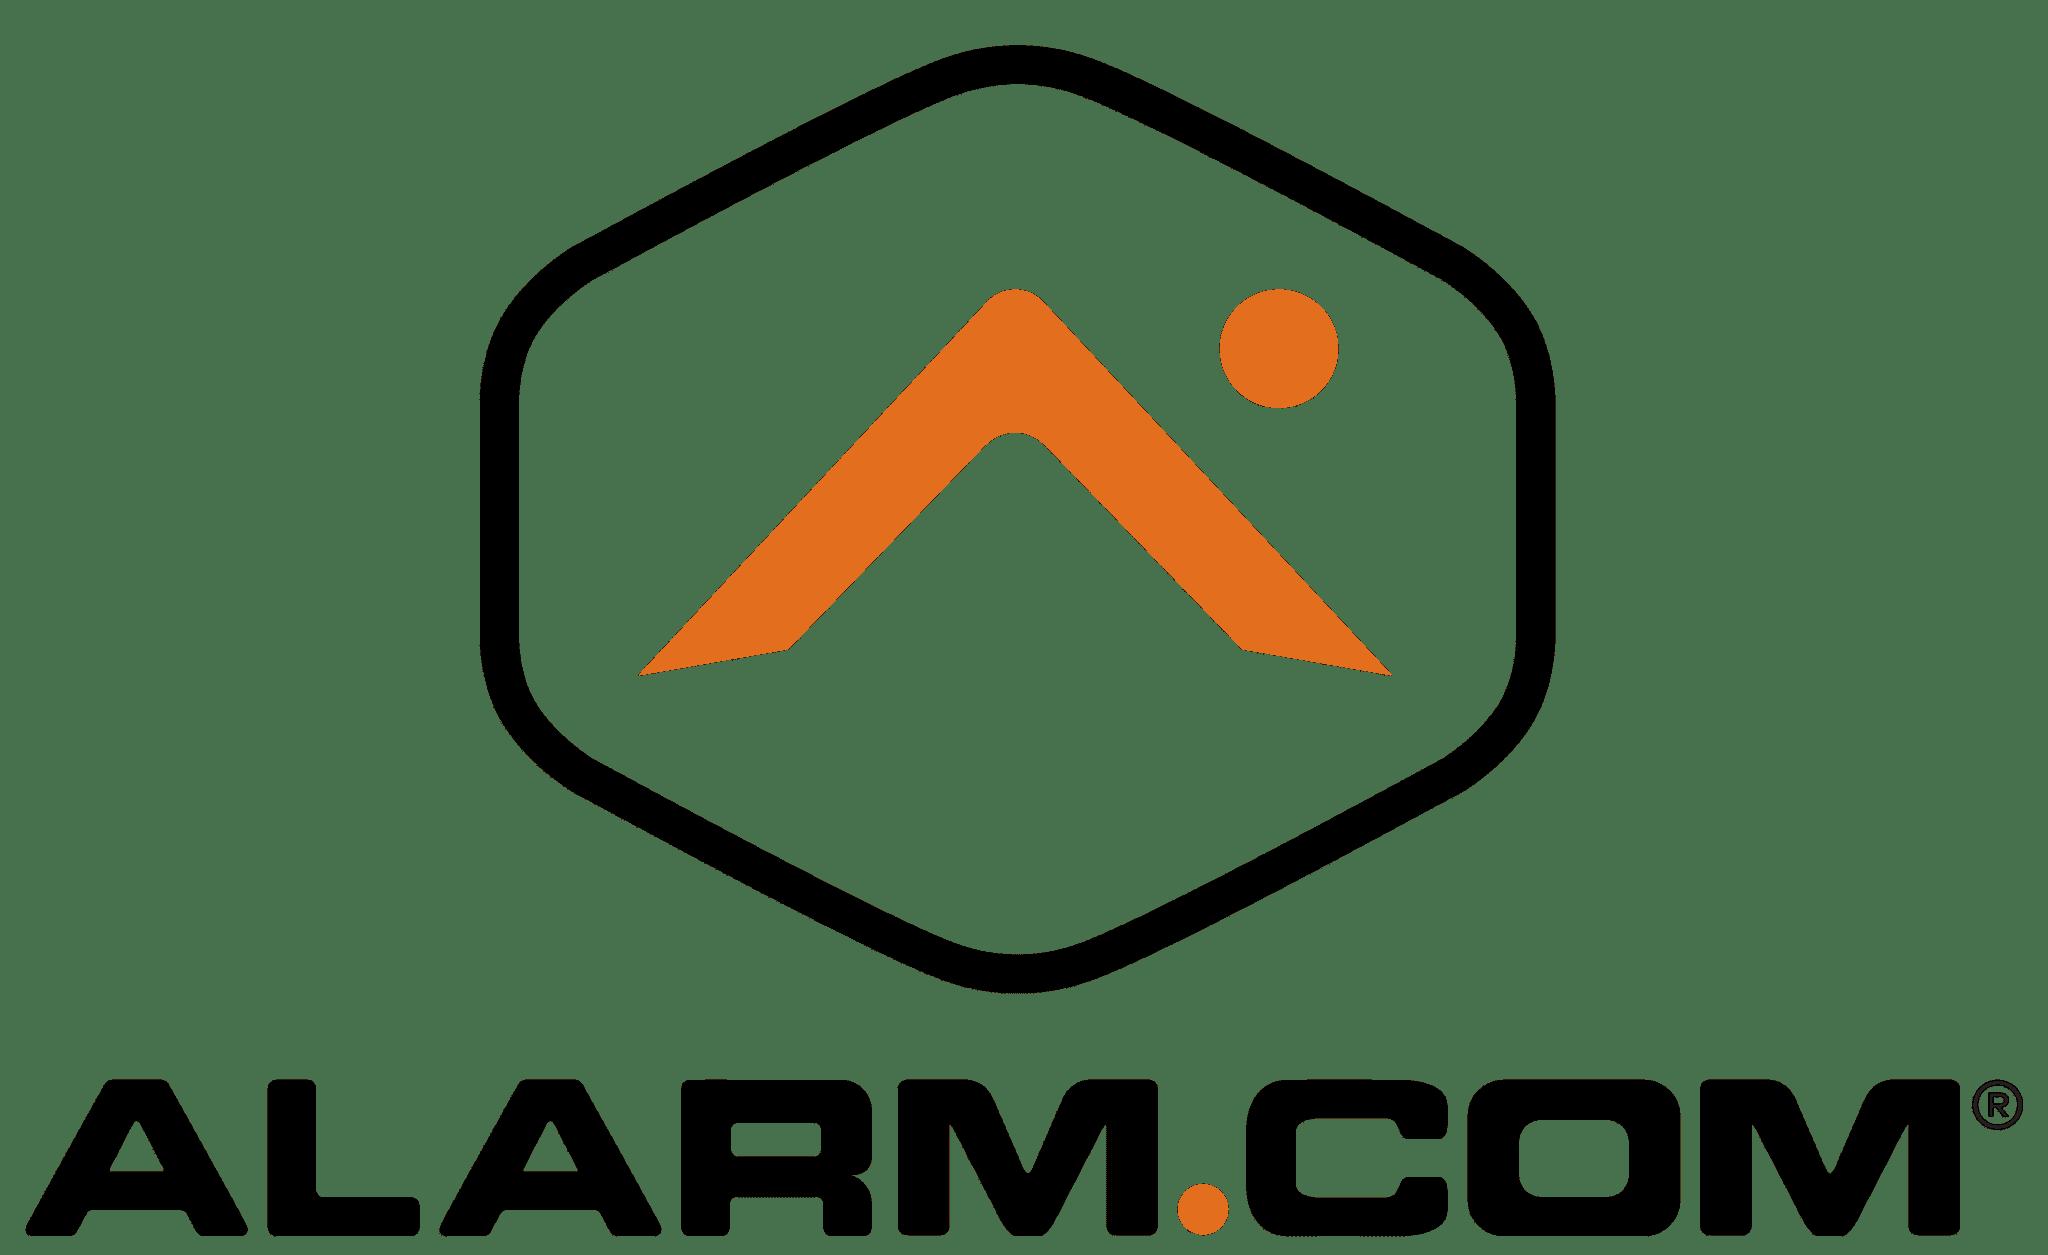 Dominion design integration for San antonio home alarm